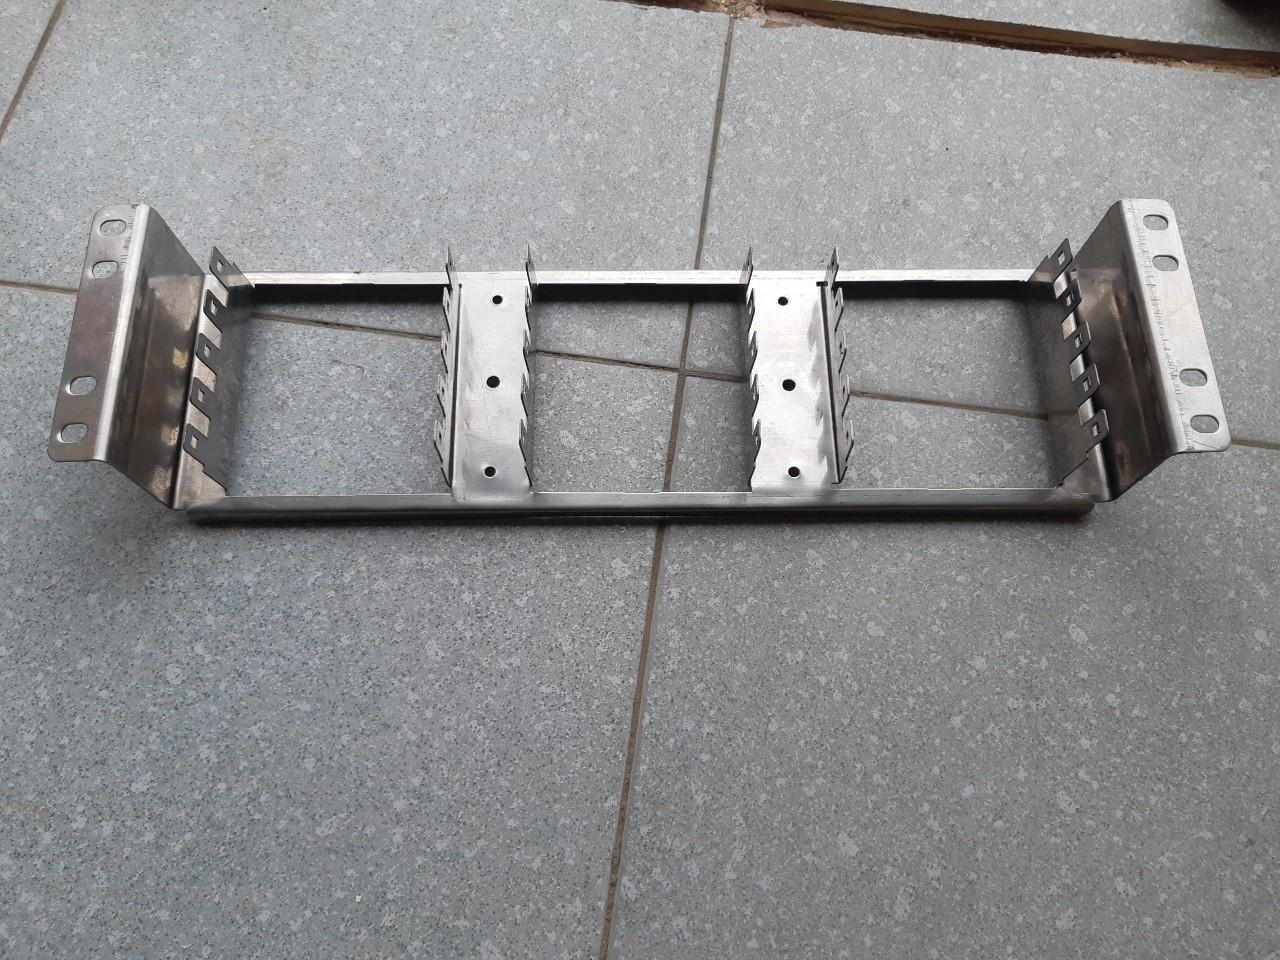 Giá đỡ phiến Krone MDF Rack 150 đôi, 150 pair, 150x2